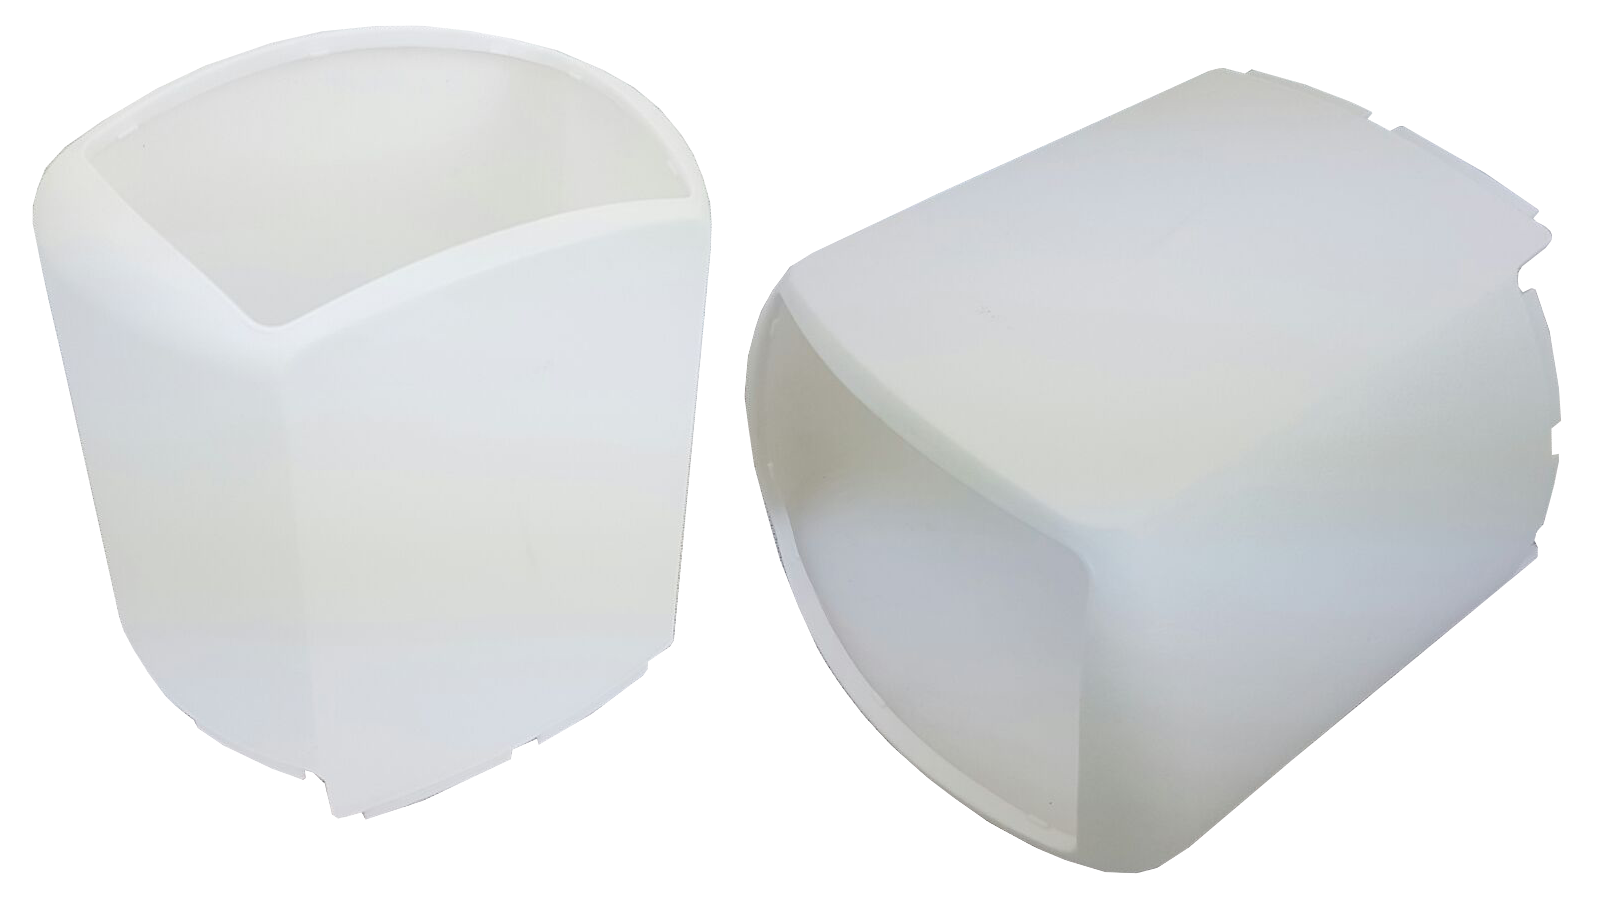 Calotta frontale per vk 121-122